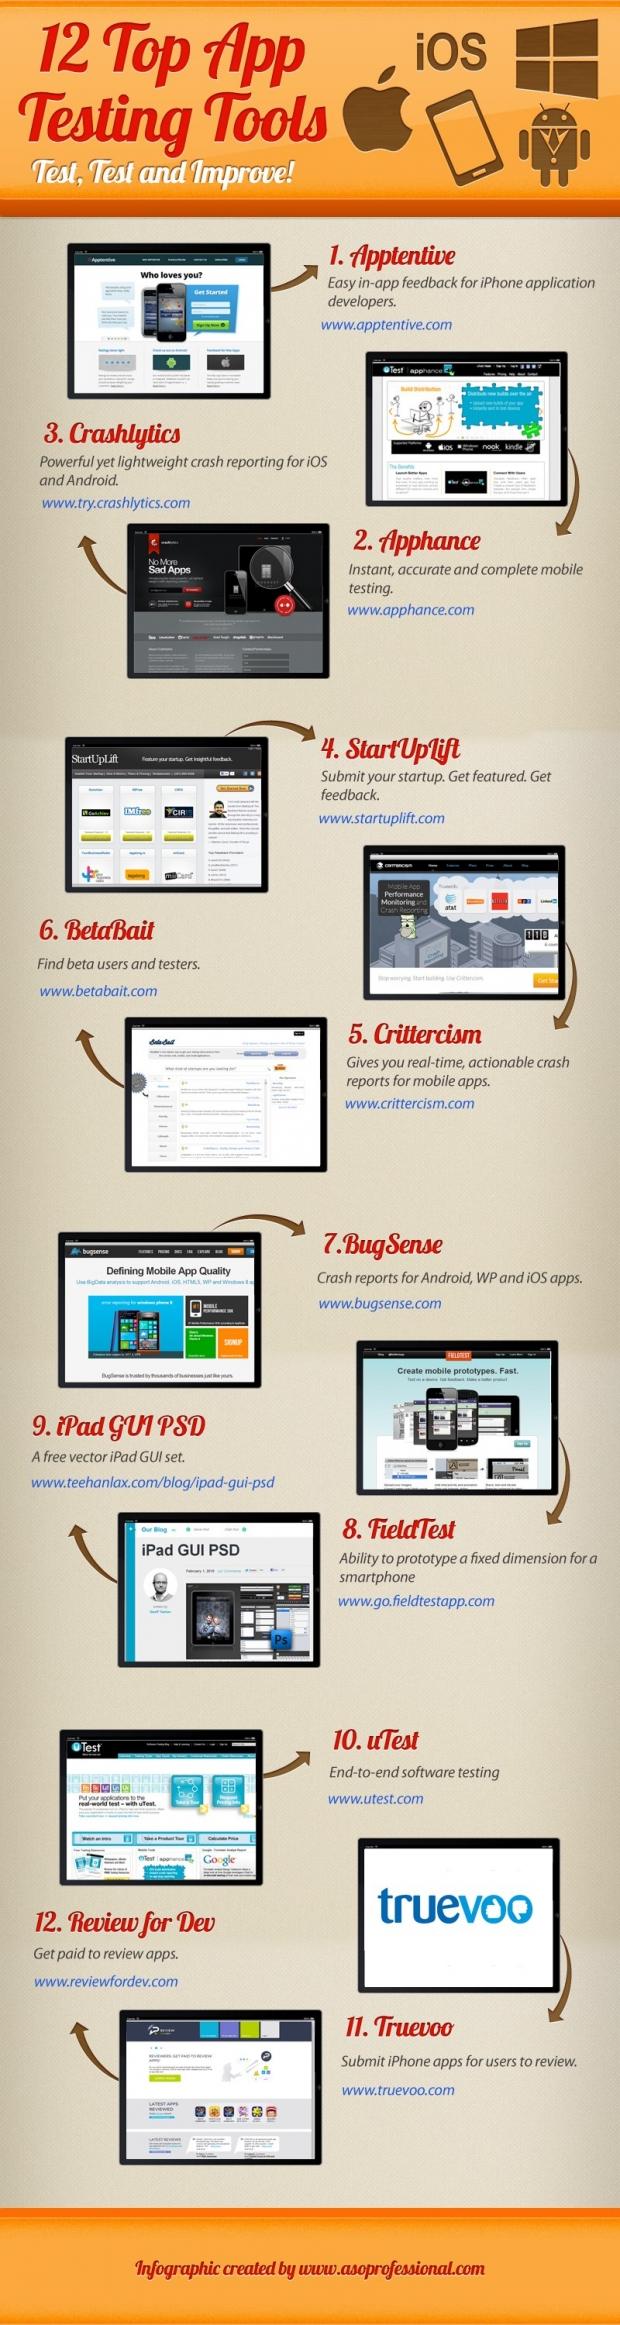 Top App Testing Tools | Digital marketing | Pinterest | Tops ...